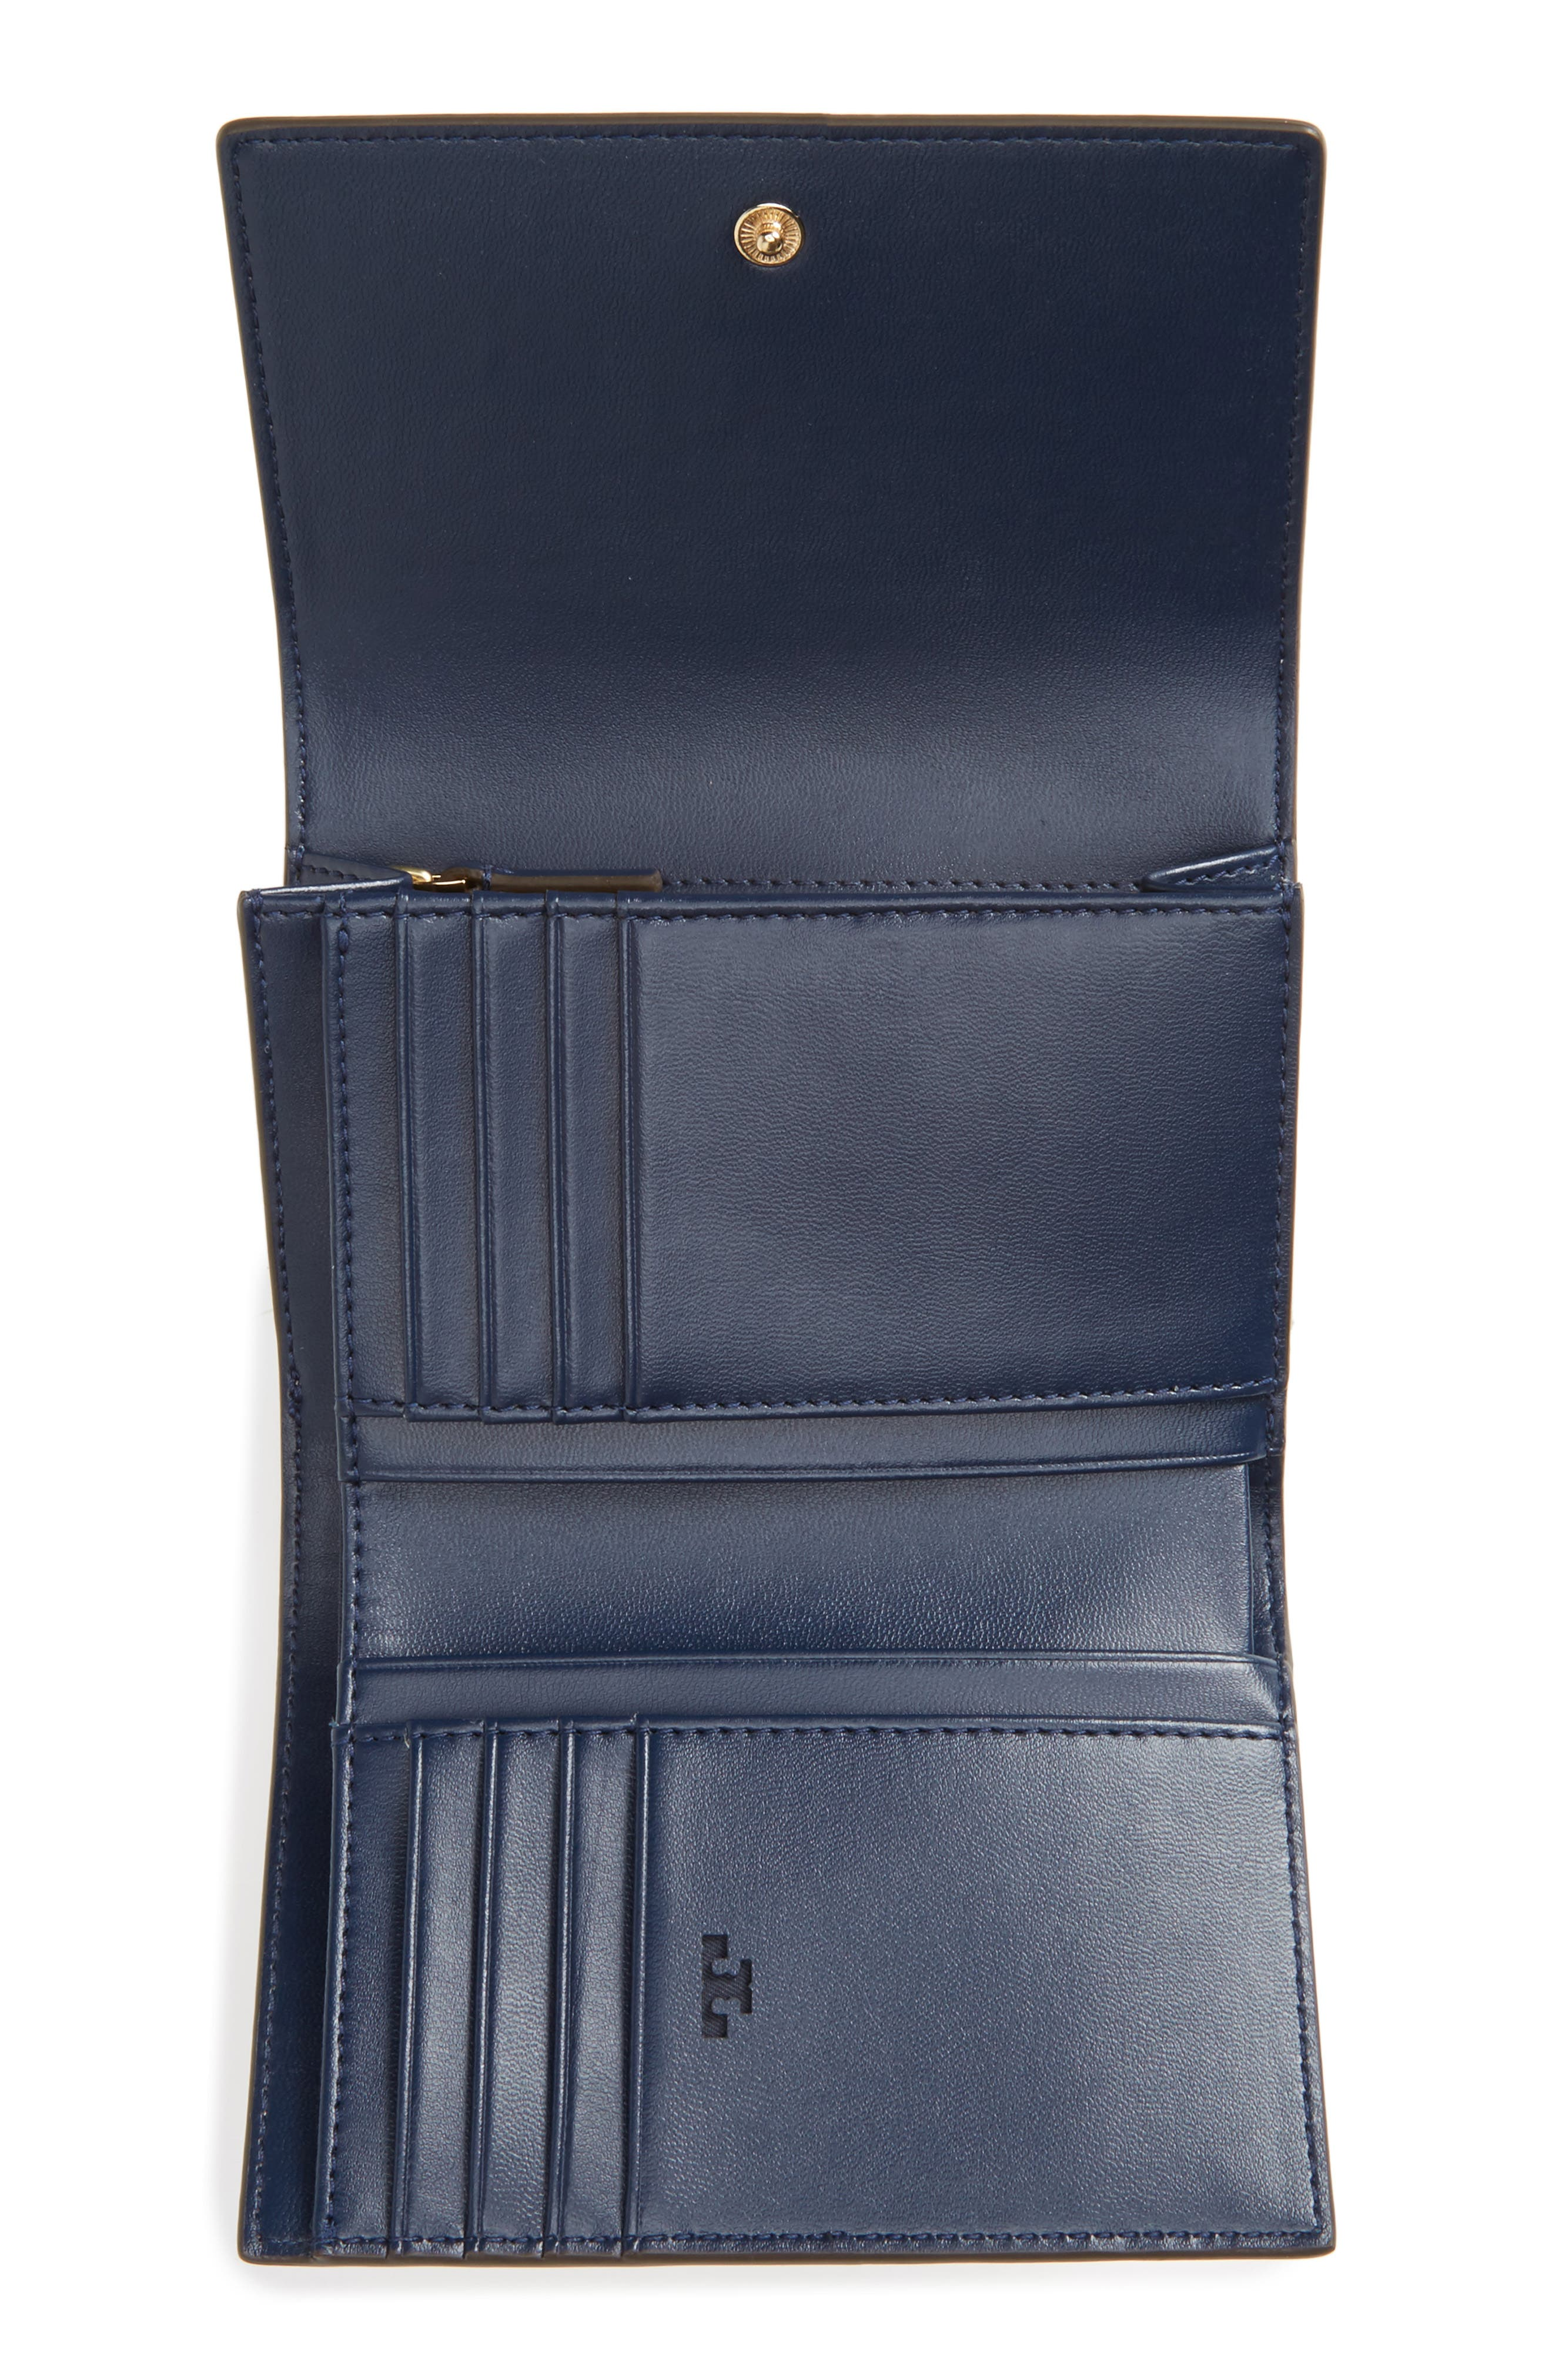 Robinson Medium Leather Wallet,                             Alternate thumbnail 2, color,                             Pale Apricot / Royal Navy